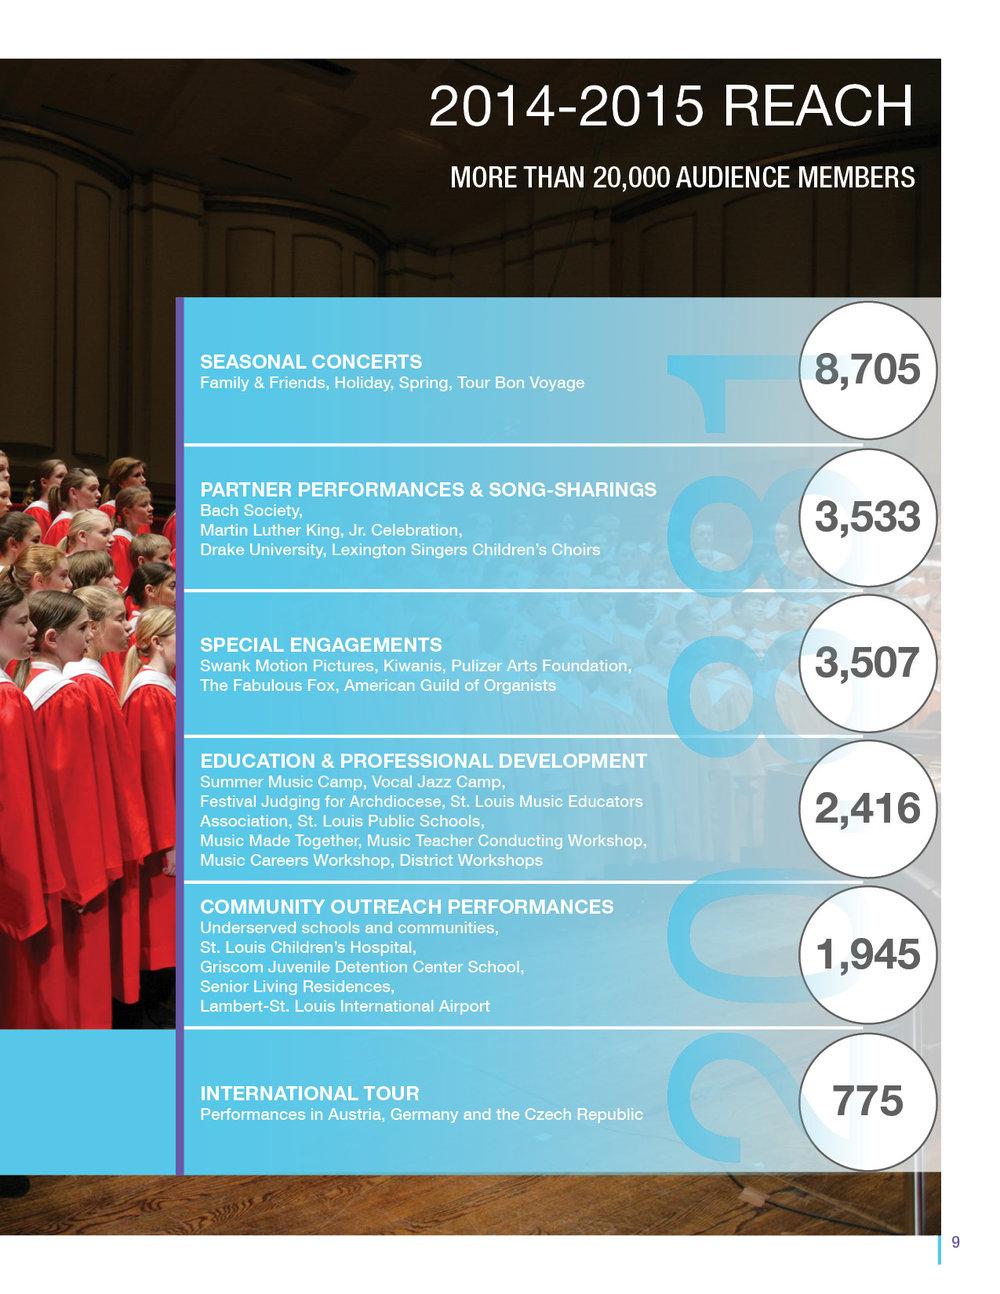 SLCC_Annual Report_2015_V12_hires9.jpg